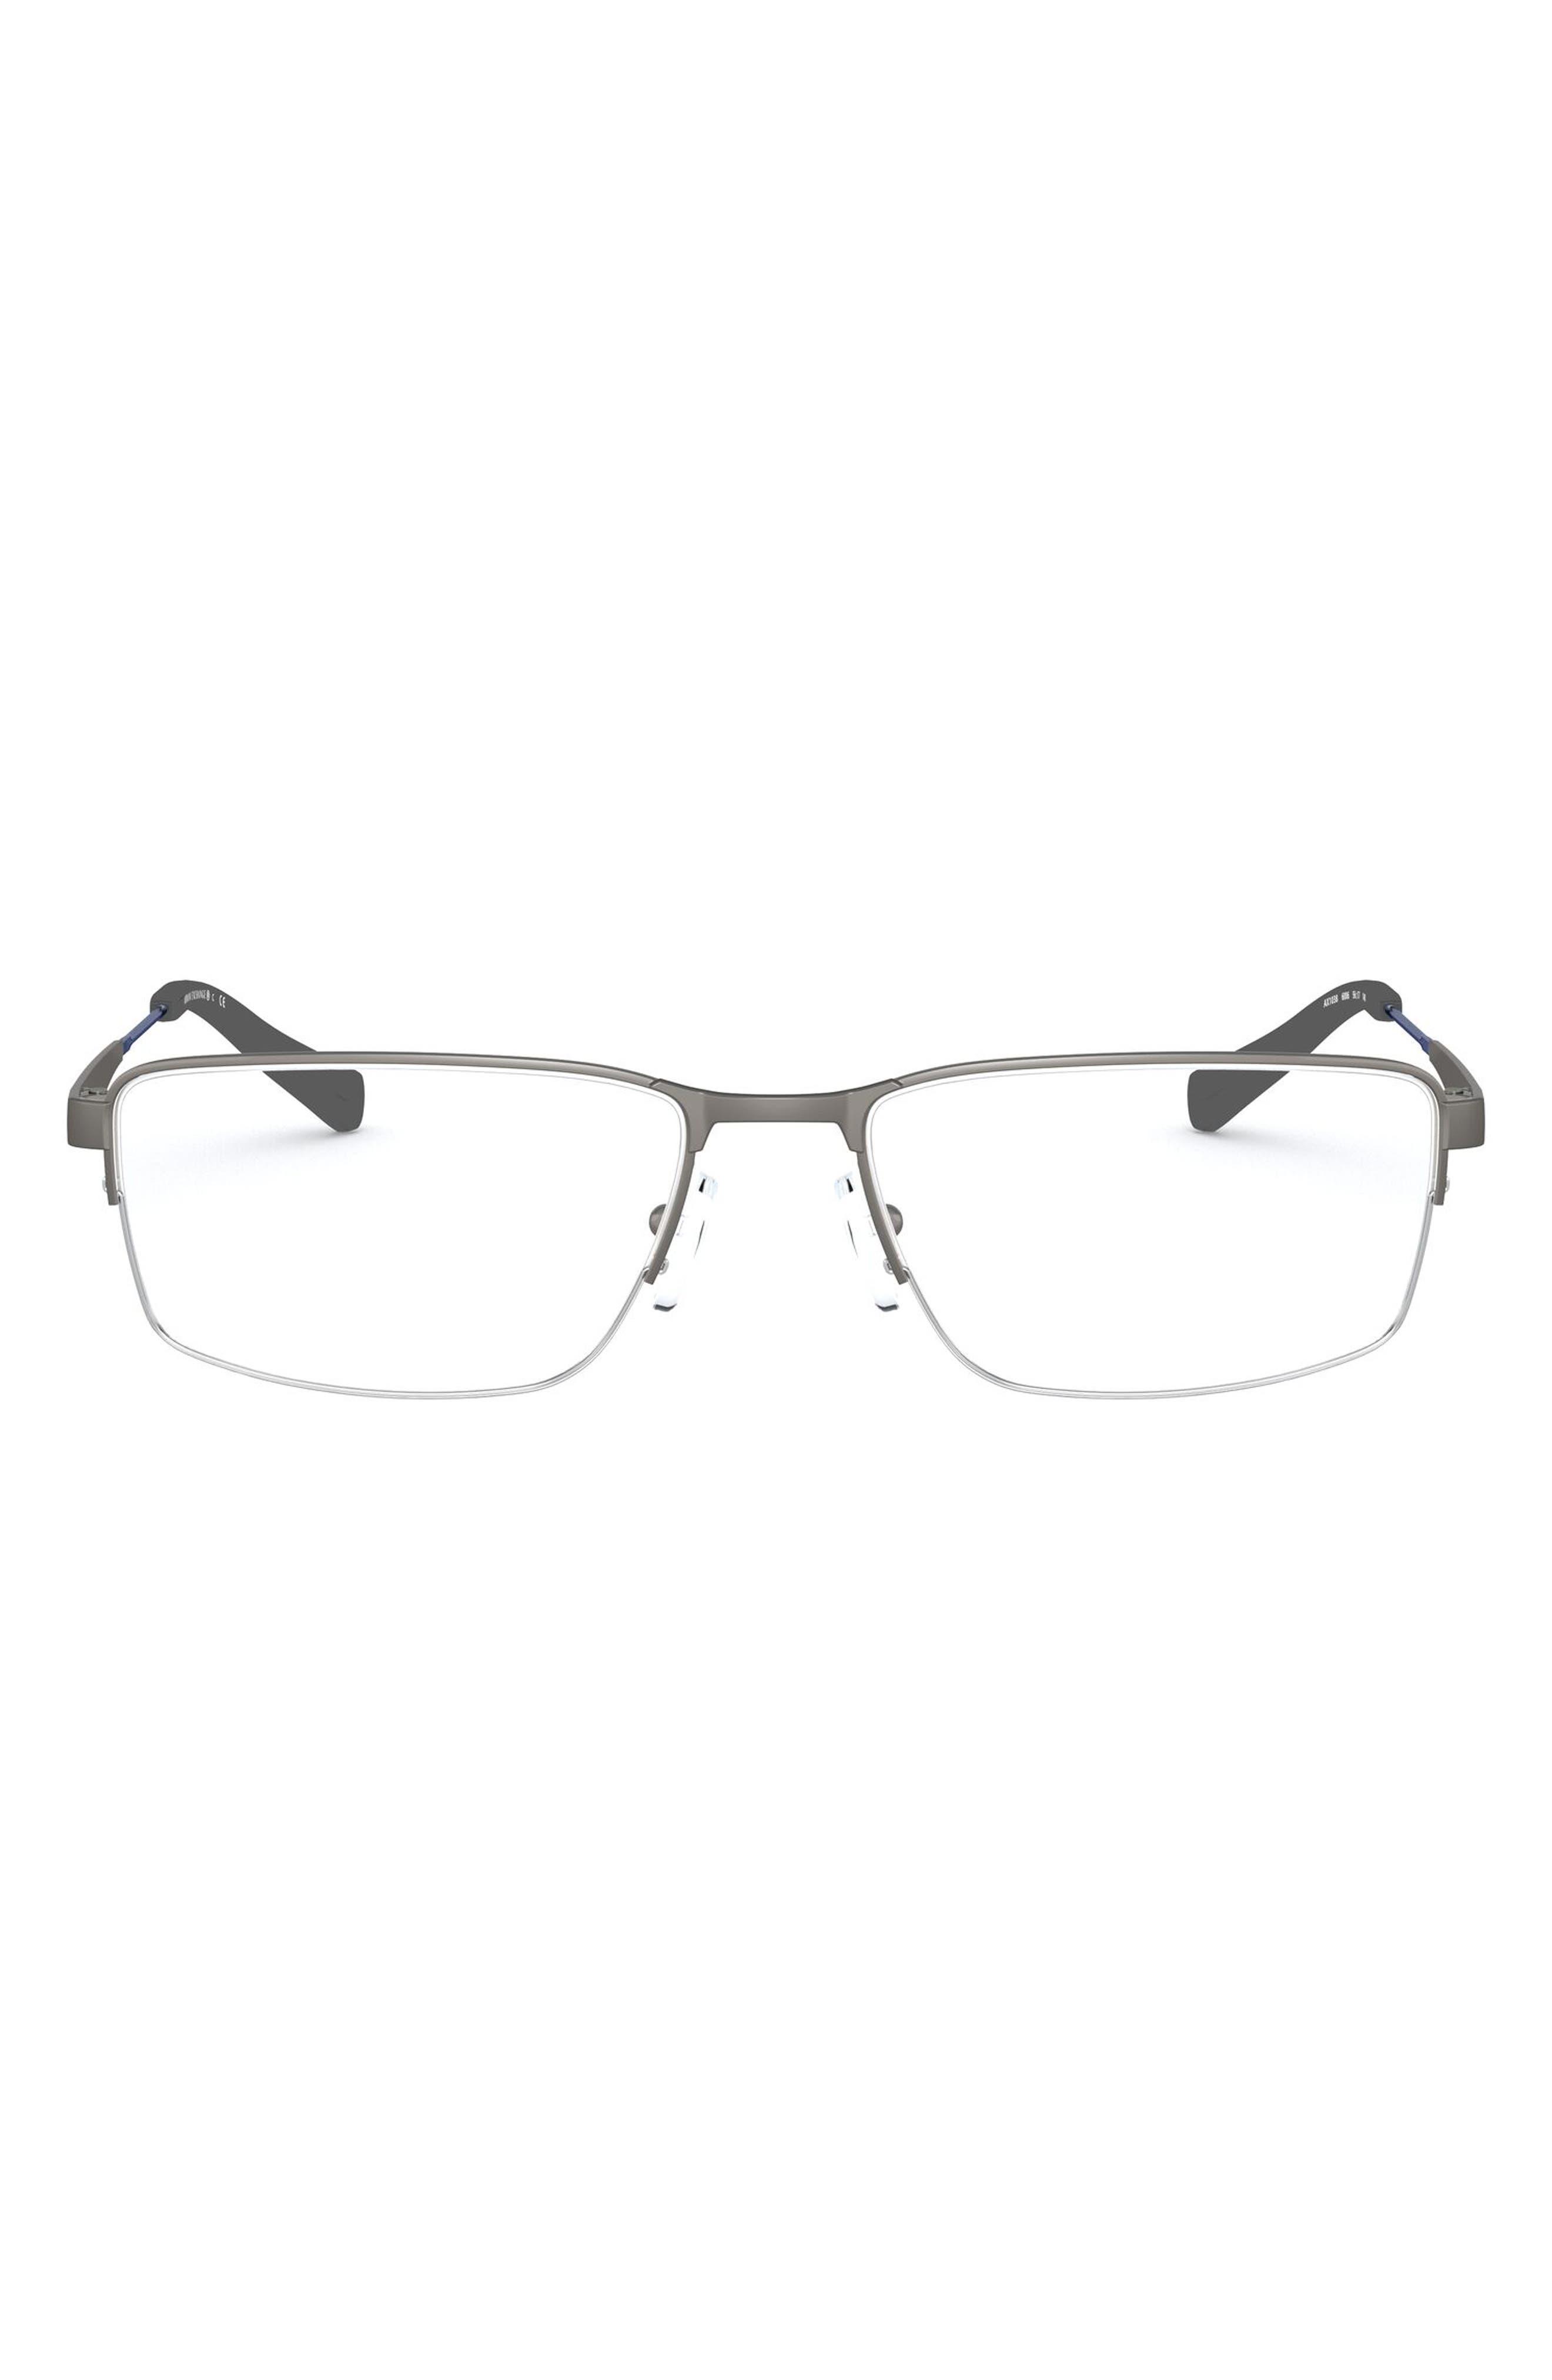 56mm Semirimless Rectangular Optical Glasses